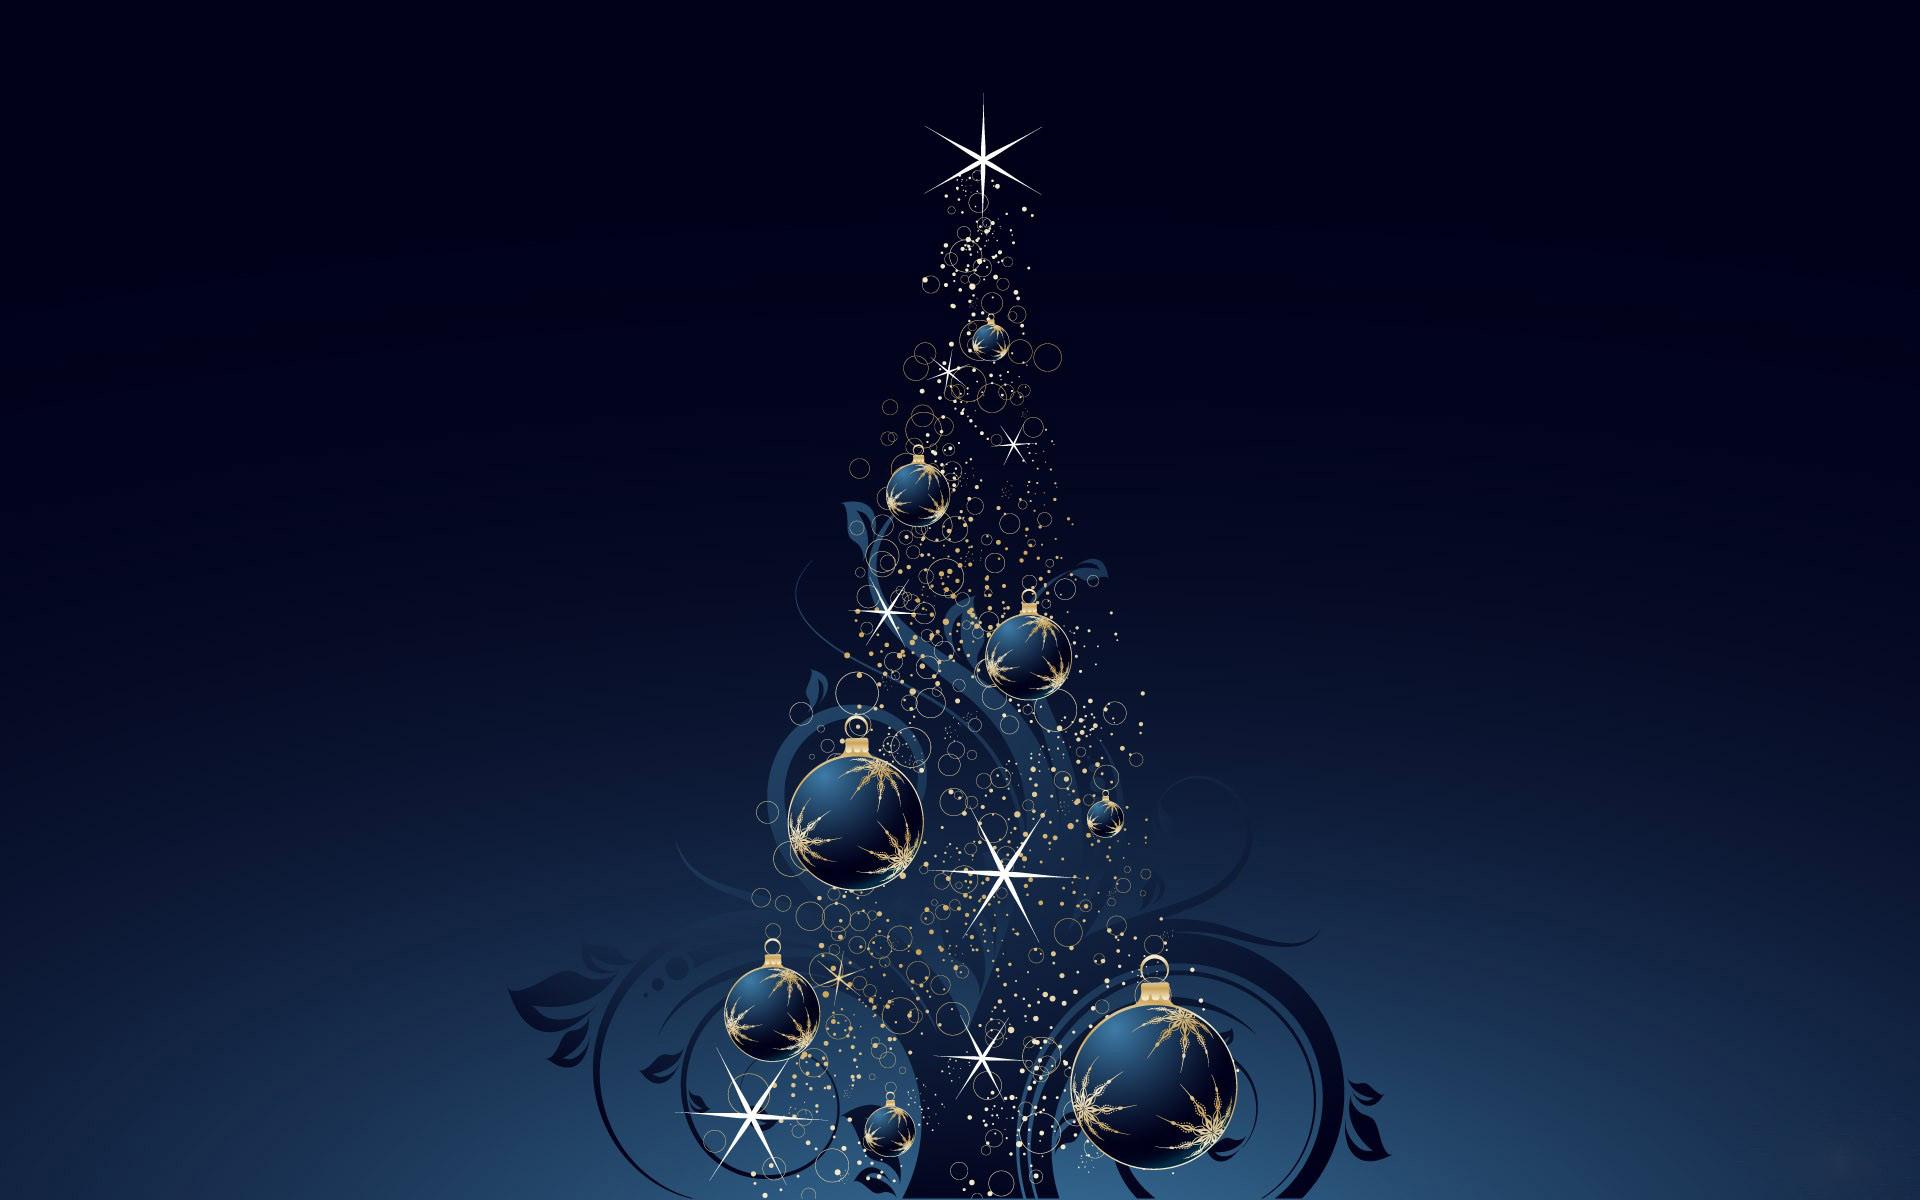 christmas hd live wallpaper for windows 7jpg 1920x1200